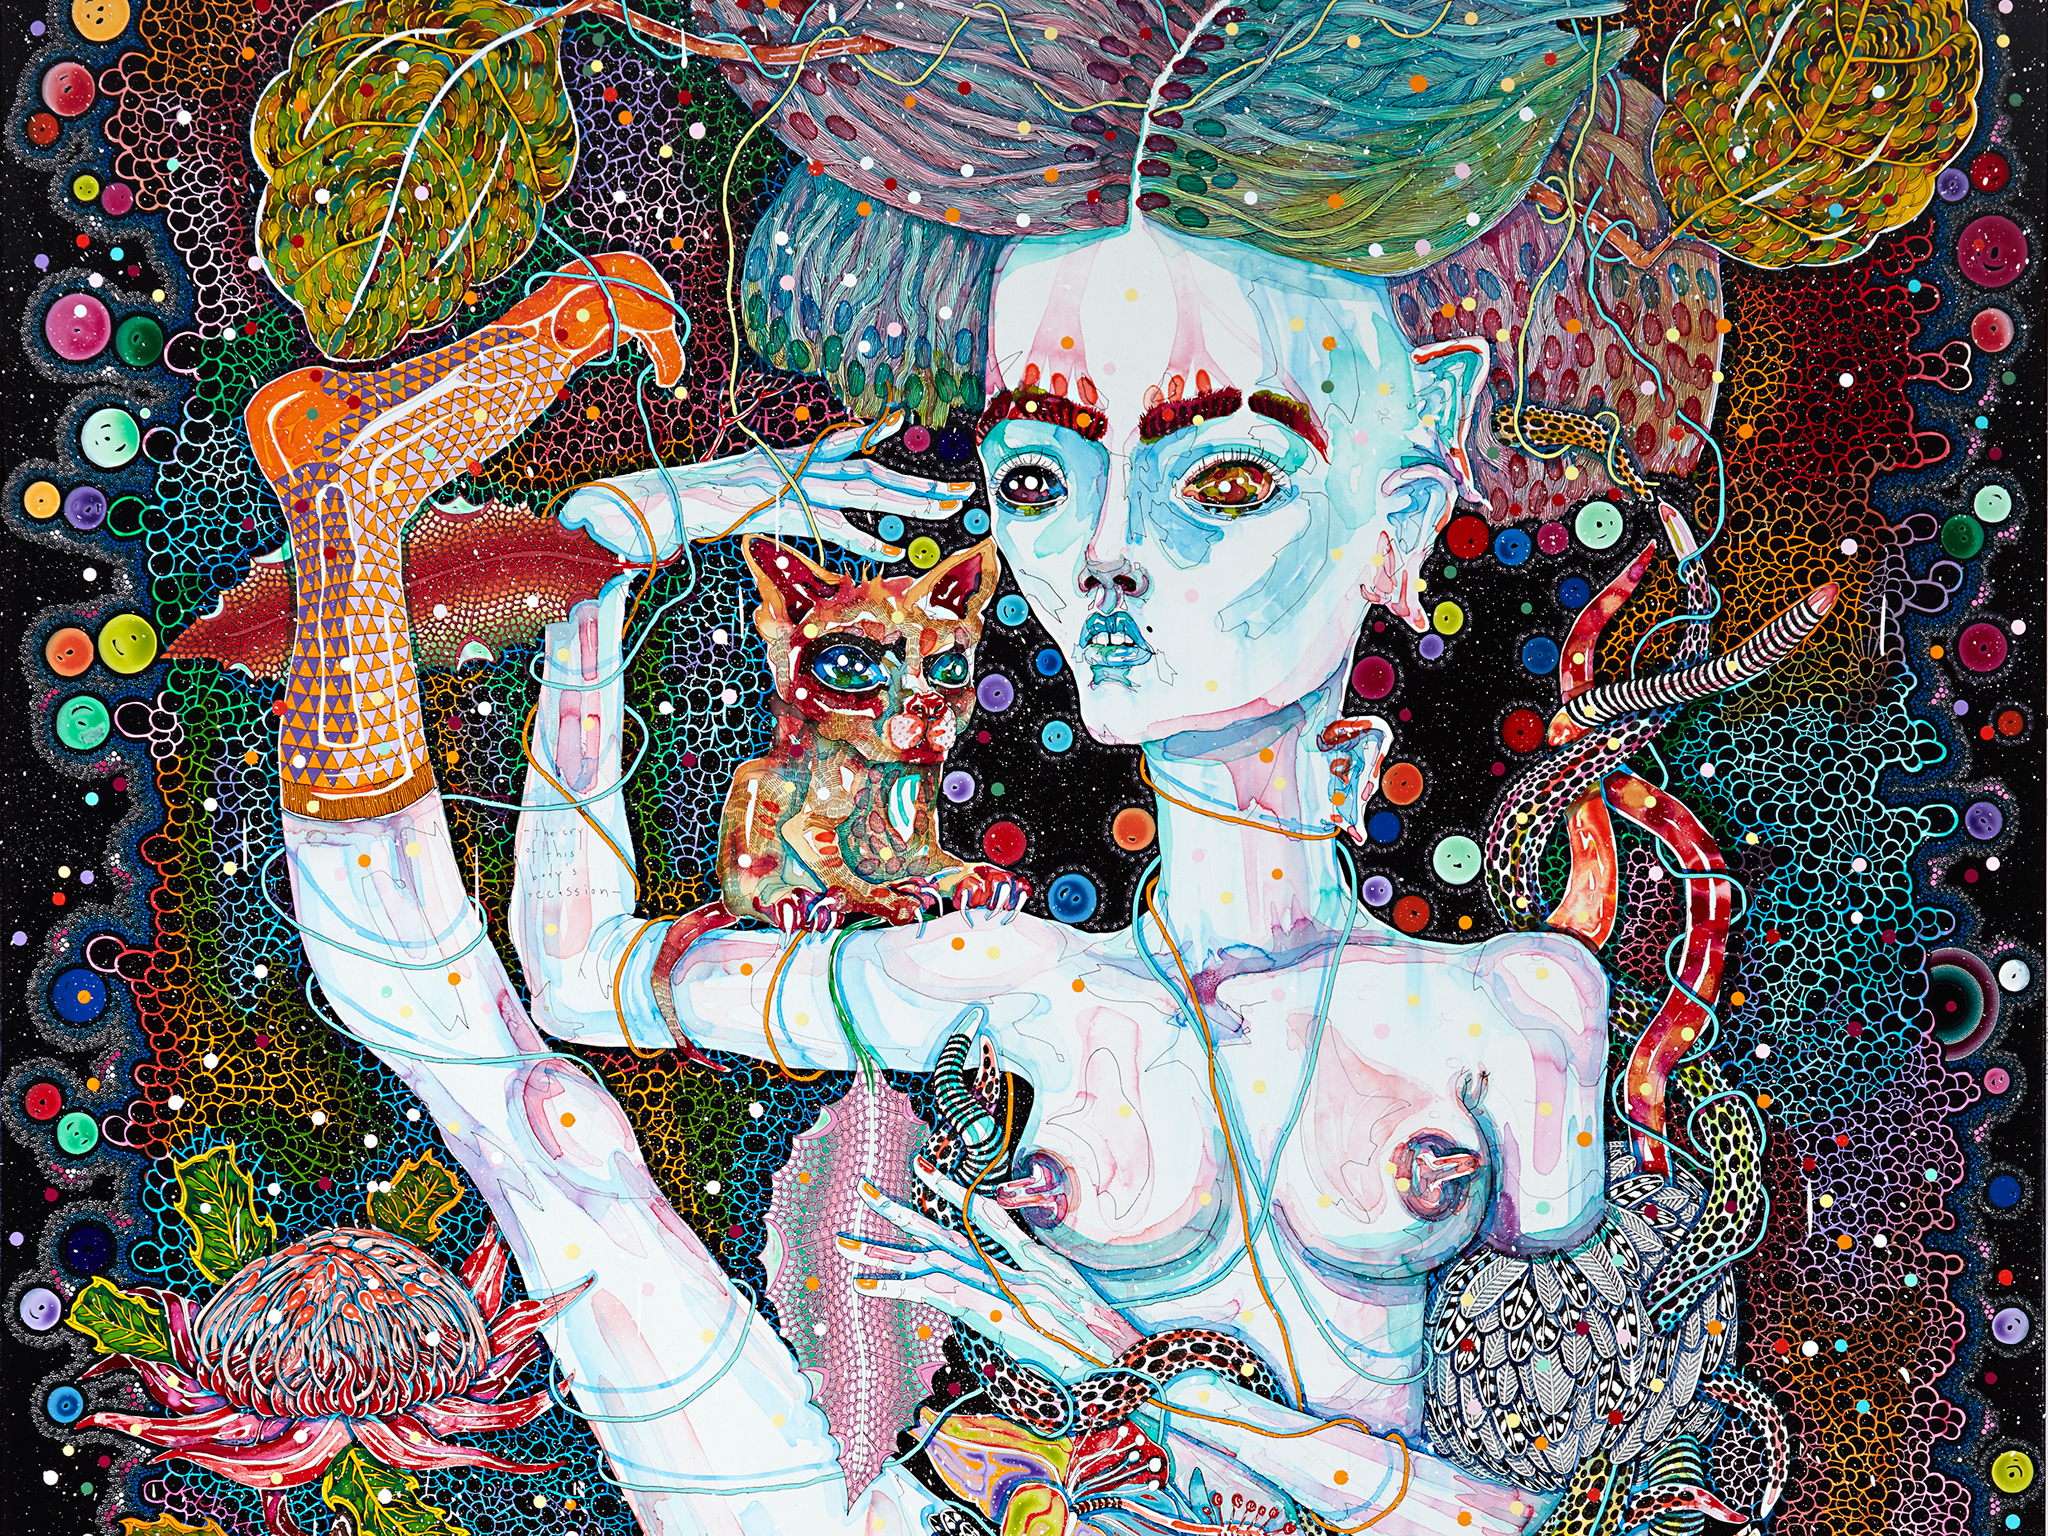 Del Kathryn Barton: Angel Dribble